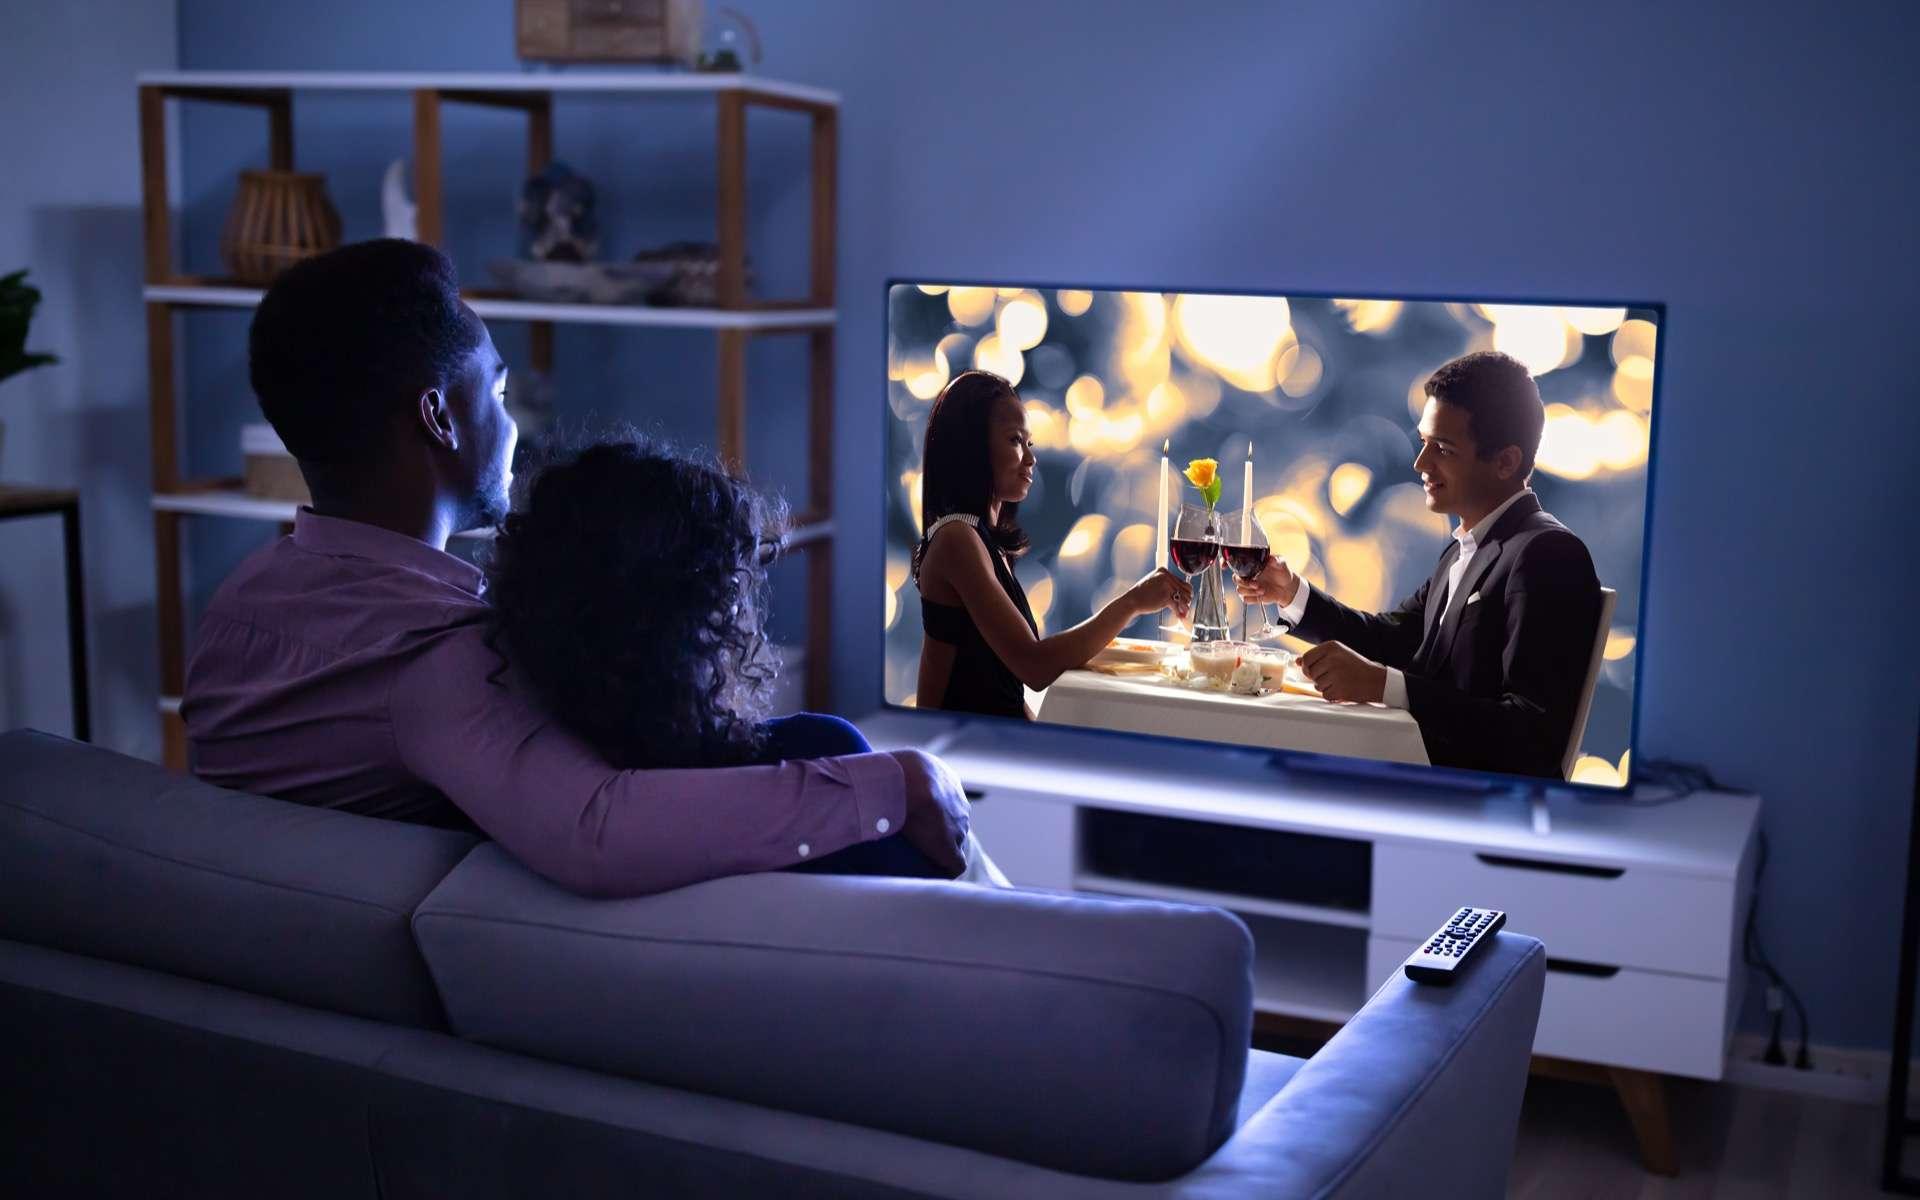 Quelle télévision choisir ? © Andrey Popov, Adobe Stock